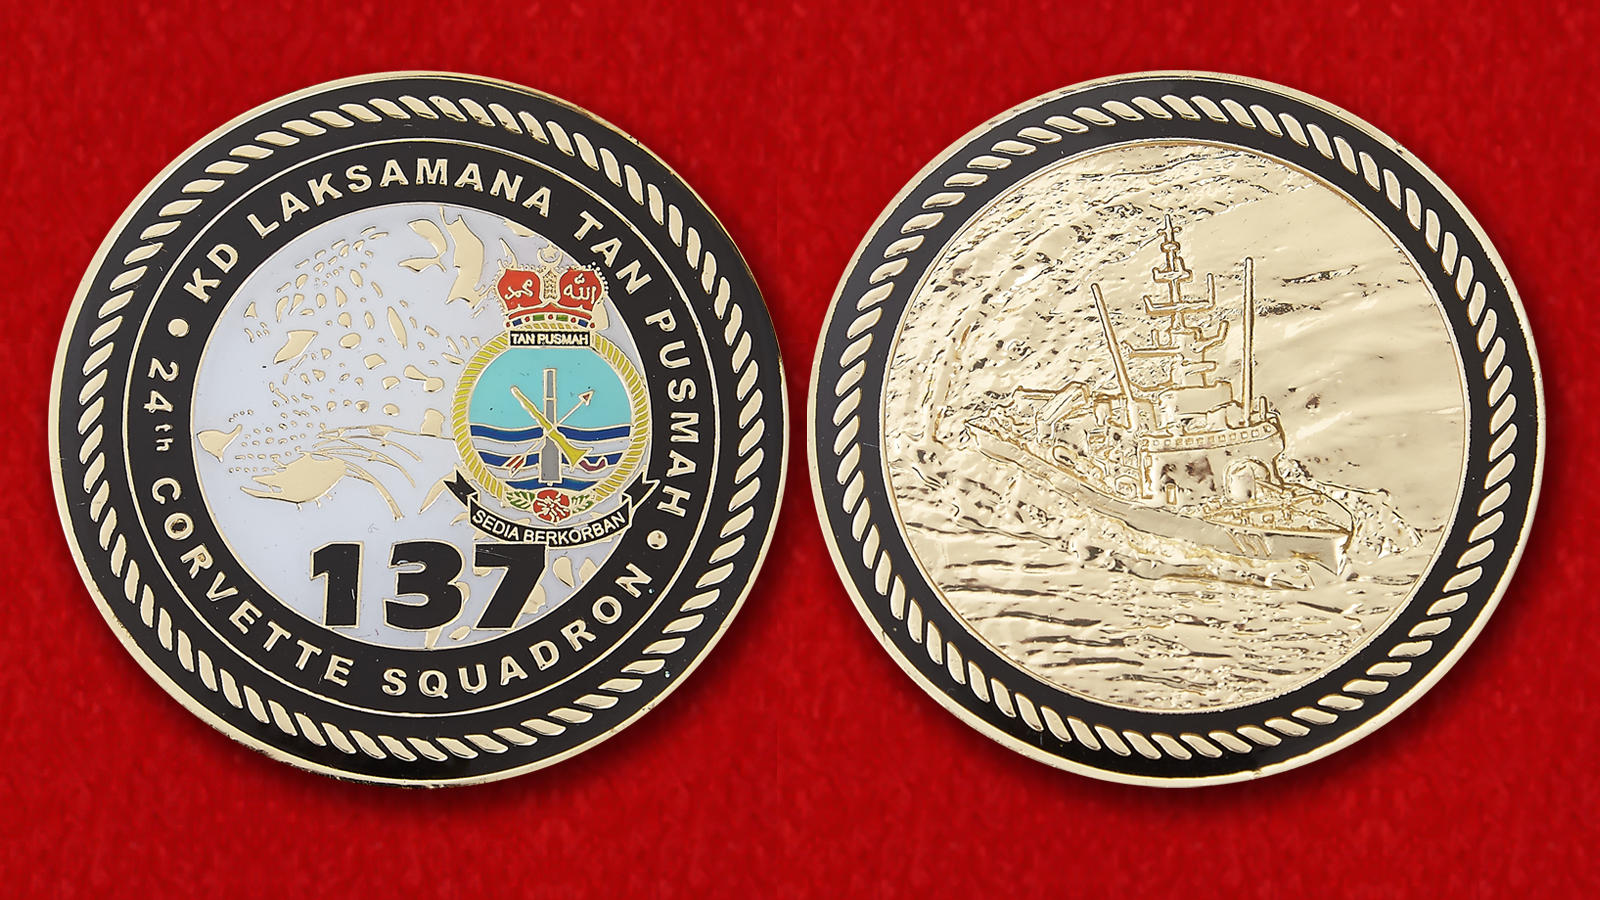 Челлендж коин корвета KD «Лаксамана Тан Пусмах» 24-го дивизиона Королевских ВМС Малайзии